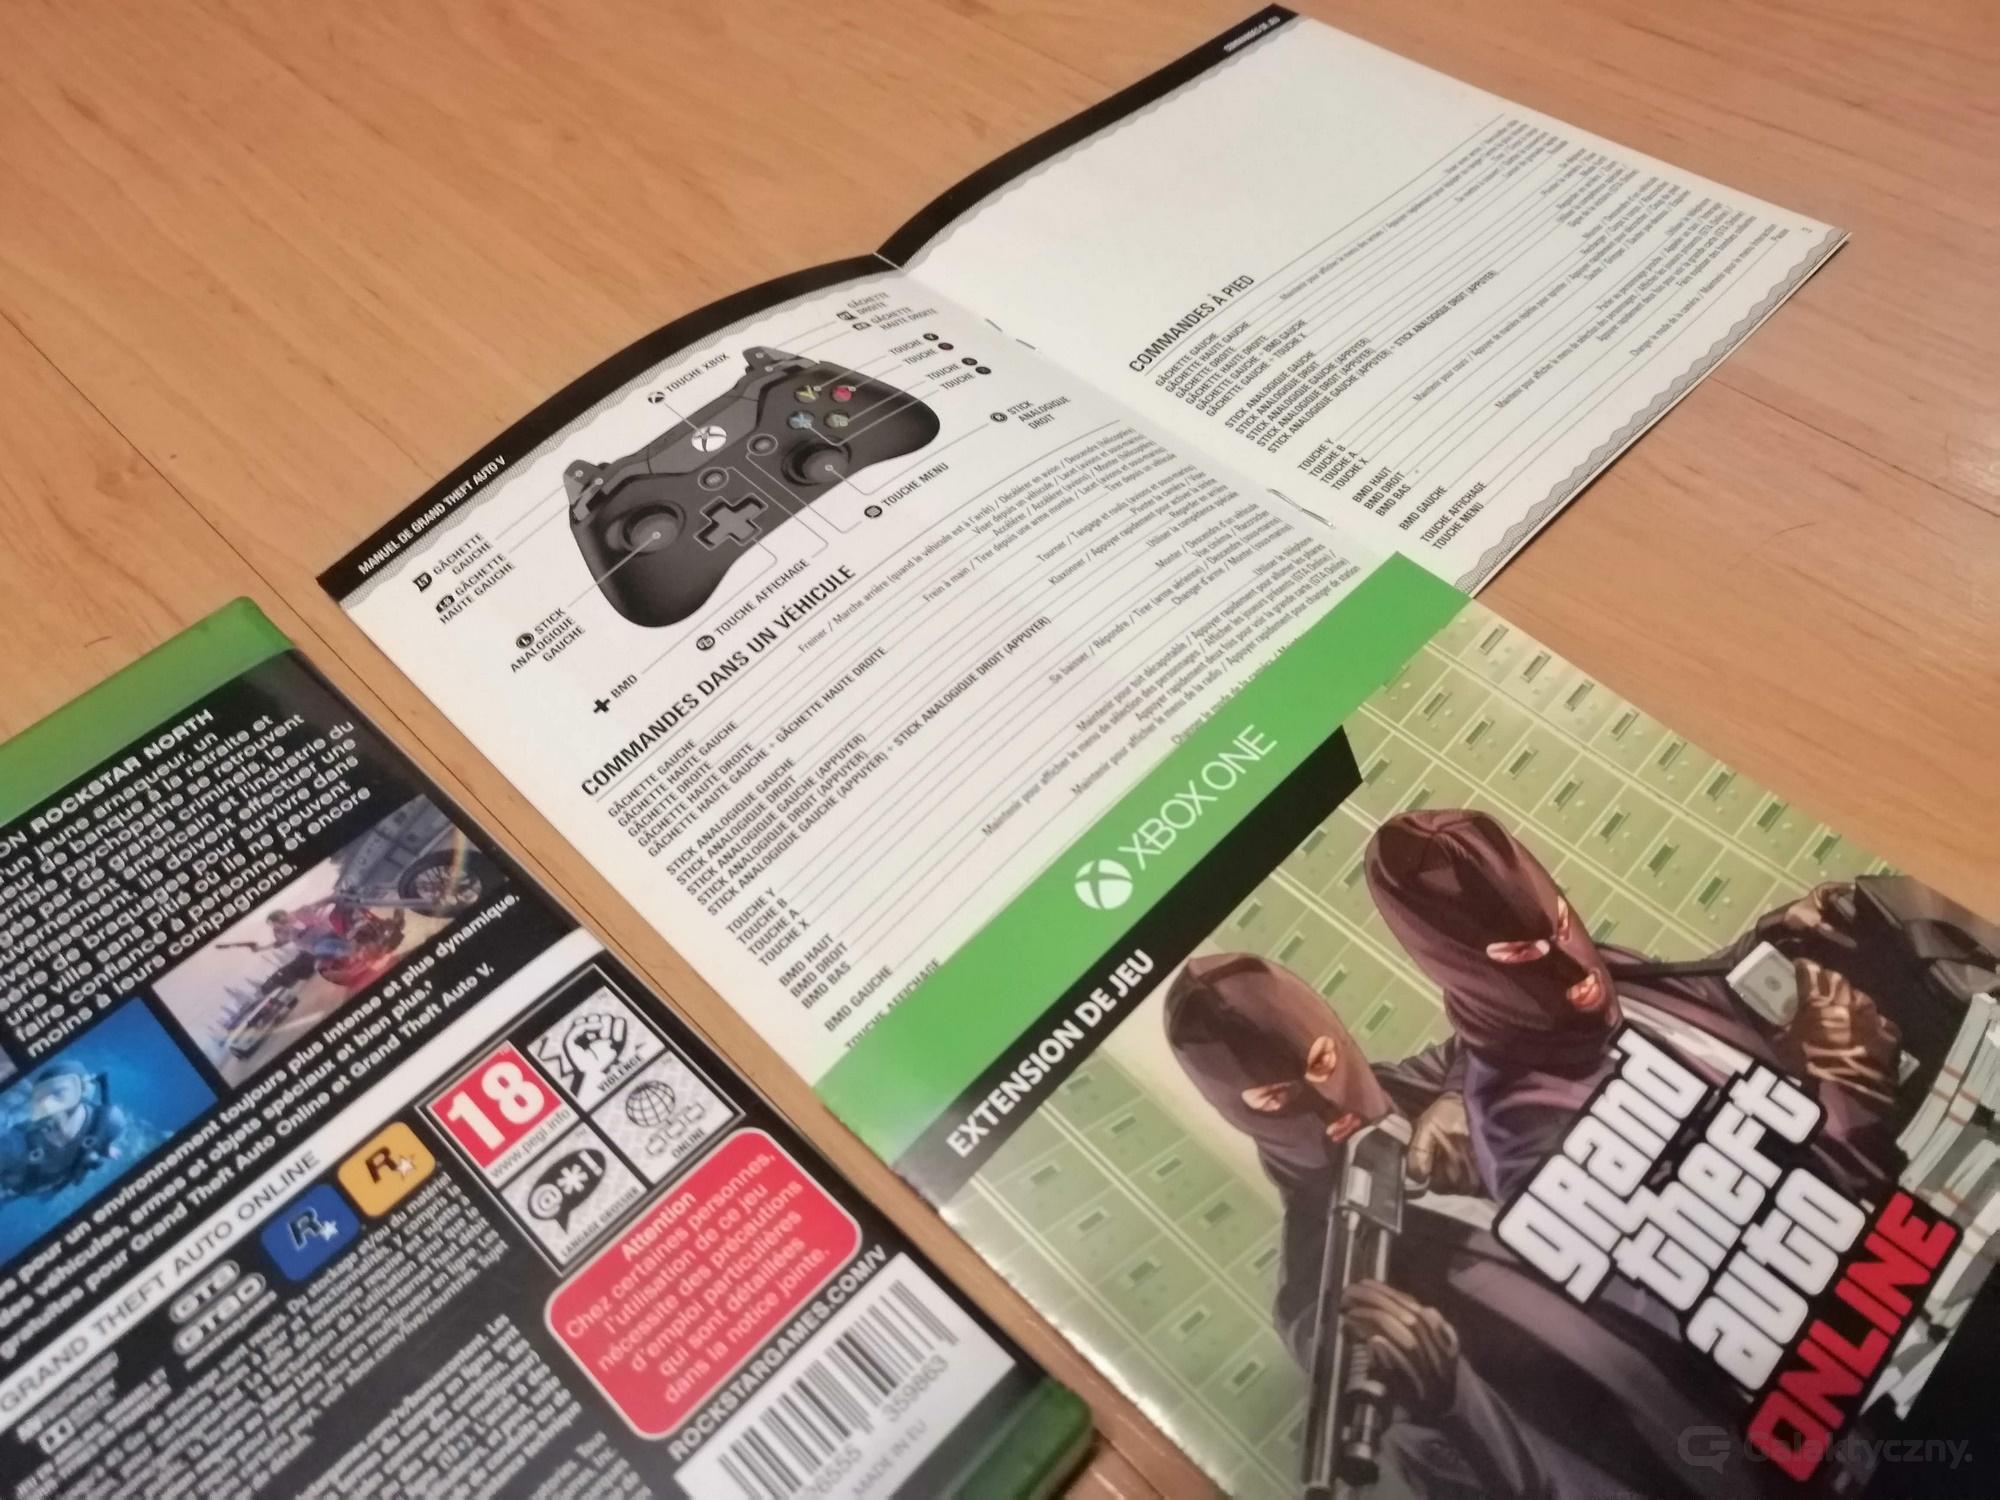 Zawartość gry GTA V z Morele.net